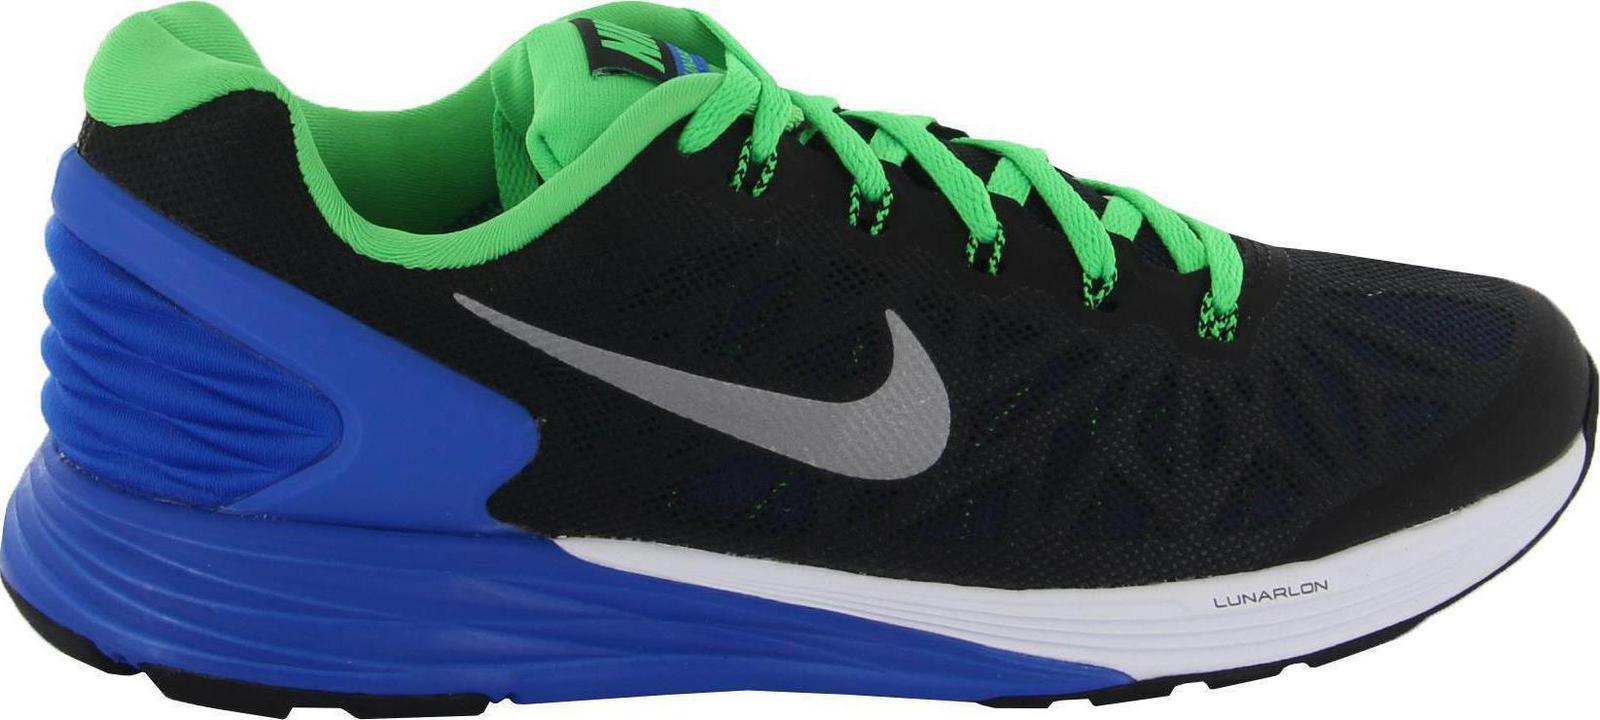 low priced a6cef c11d9 ... Προσθήκη στα αγαπημένα menu Nike Lunarglide 6 GS 54155-003 ...